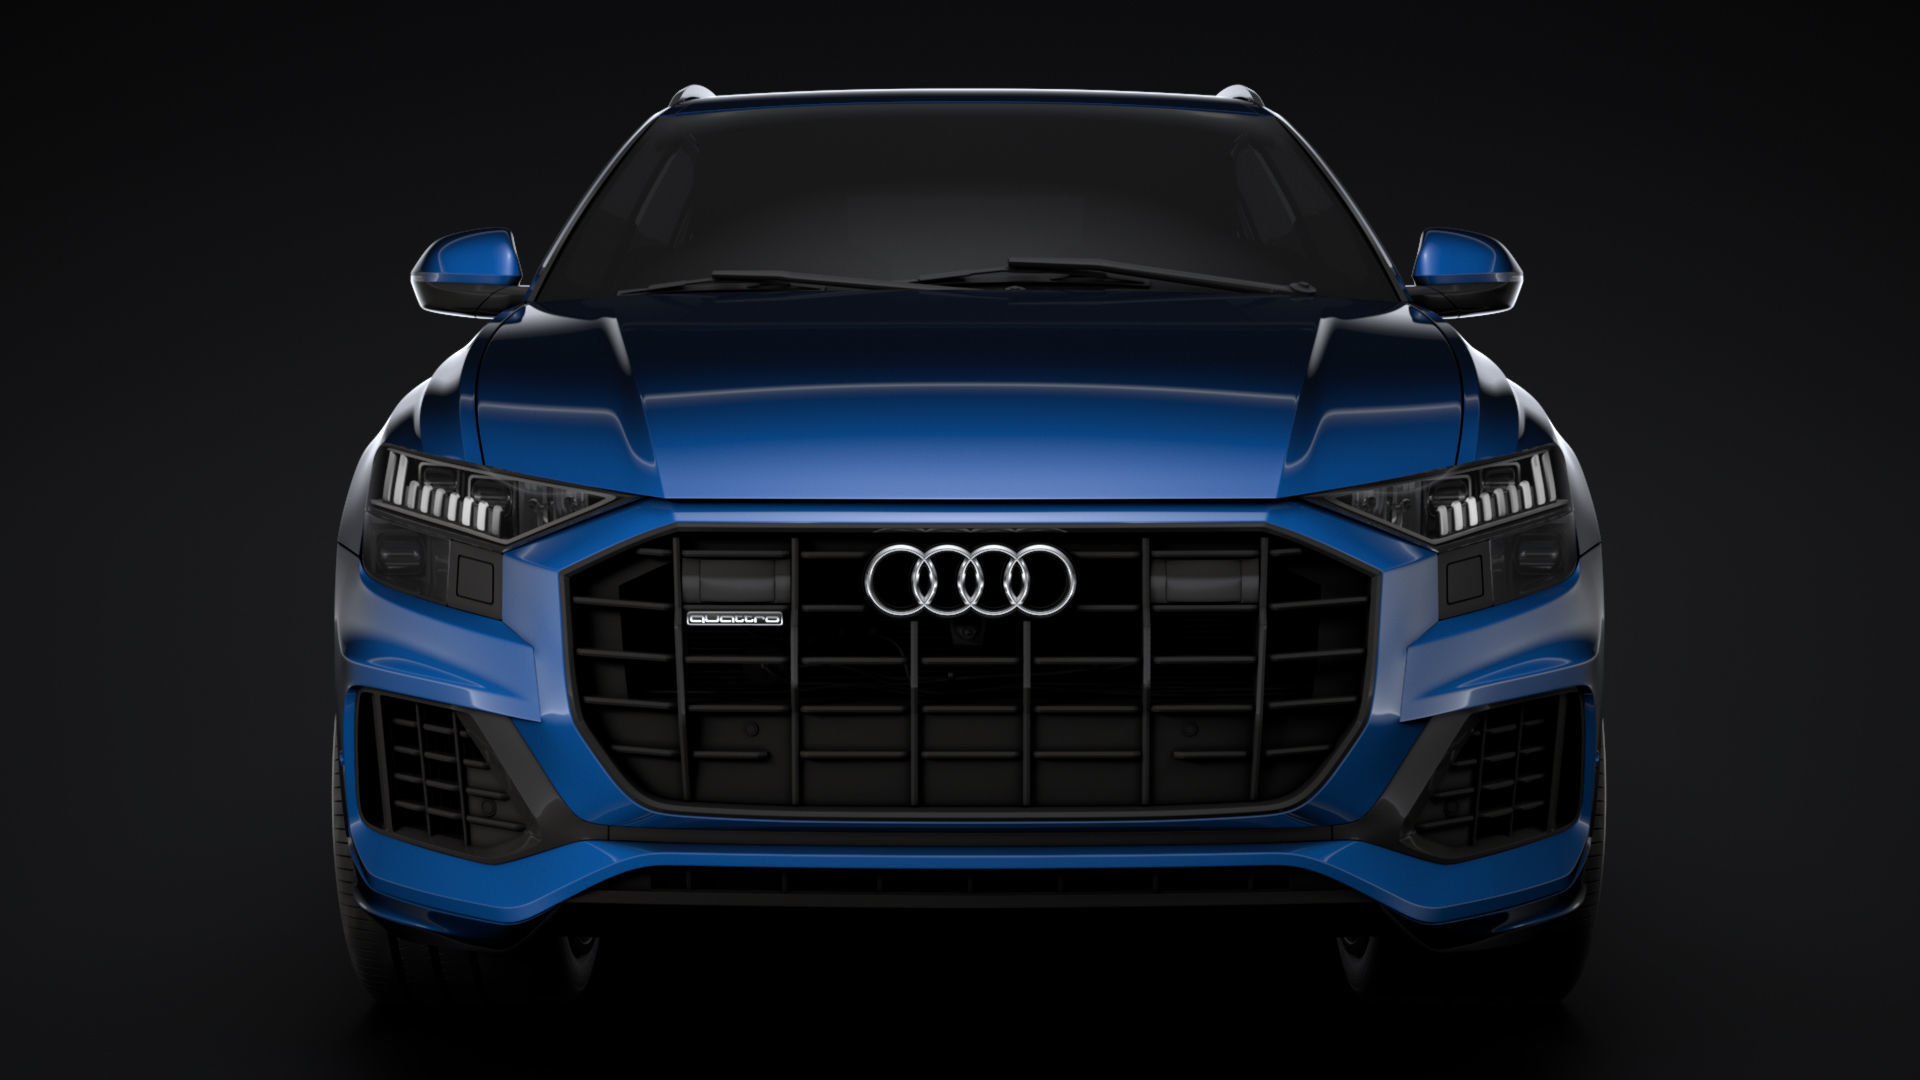 Audi Q8 55 TFSI quattro 2020